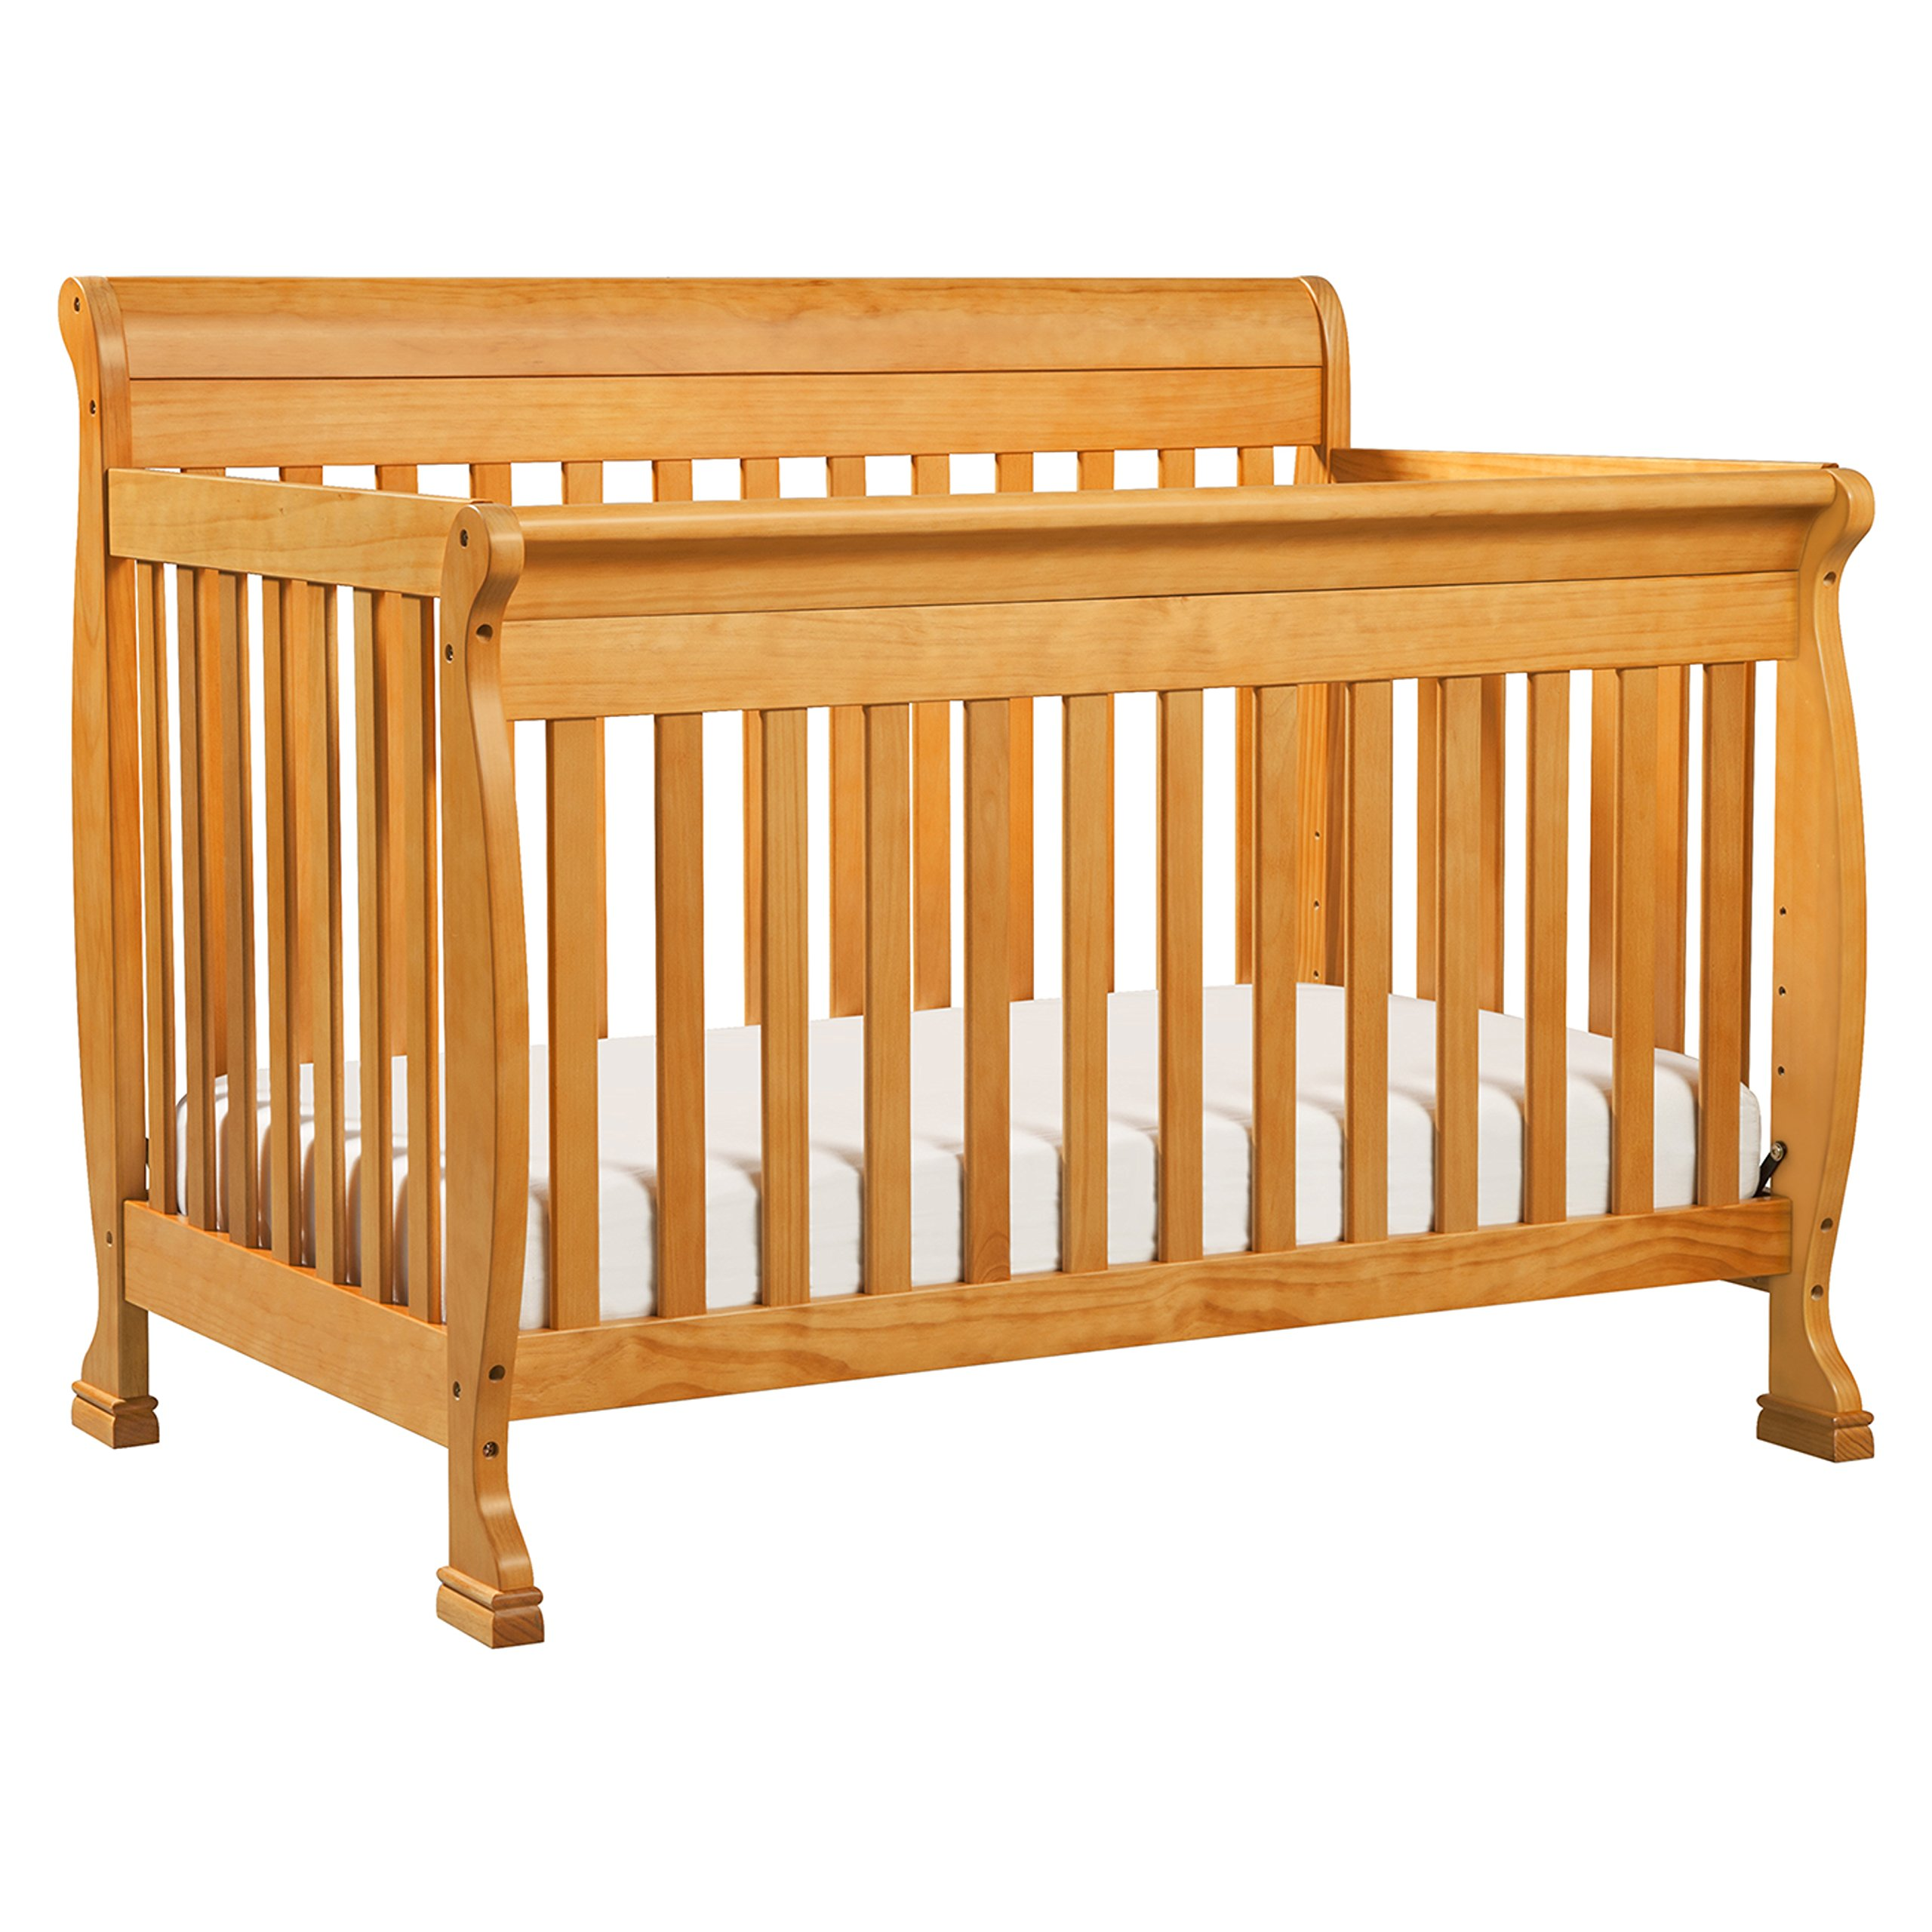 DaVinci Kalani 4-In-1 Convertible Crib, Honey Oak by DaVinci (Image #1)